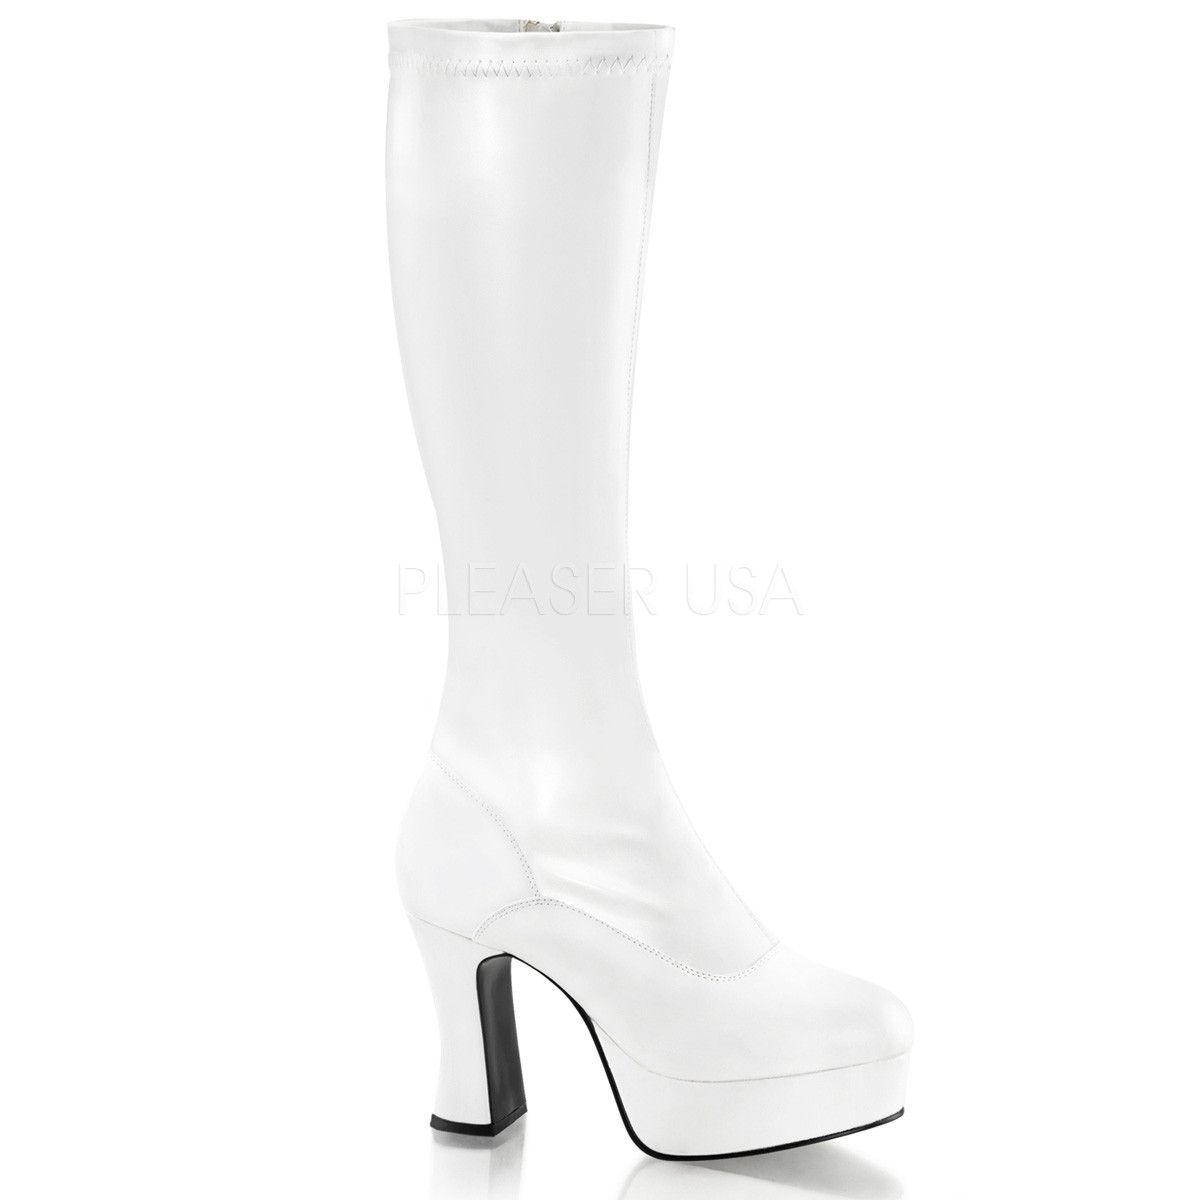 e2fddc28b7d3 FUNTASMA EXOTICA-2000 White Stretch Pu Knee High Boots